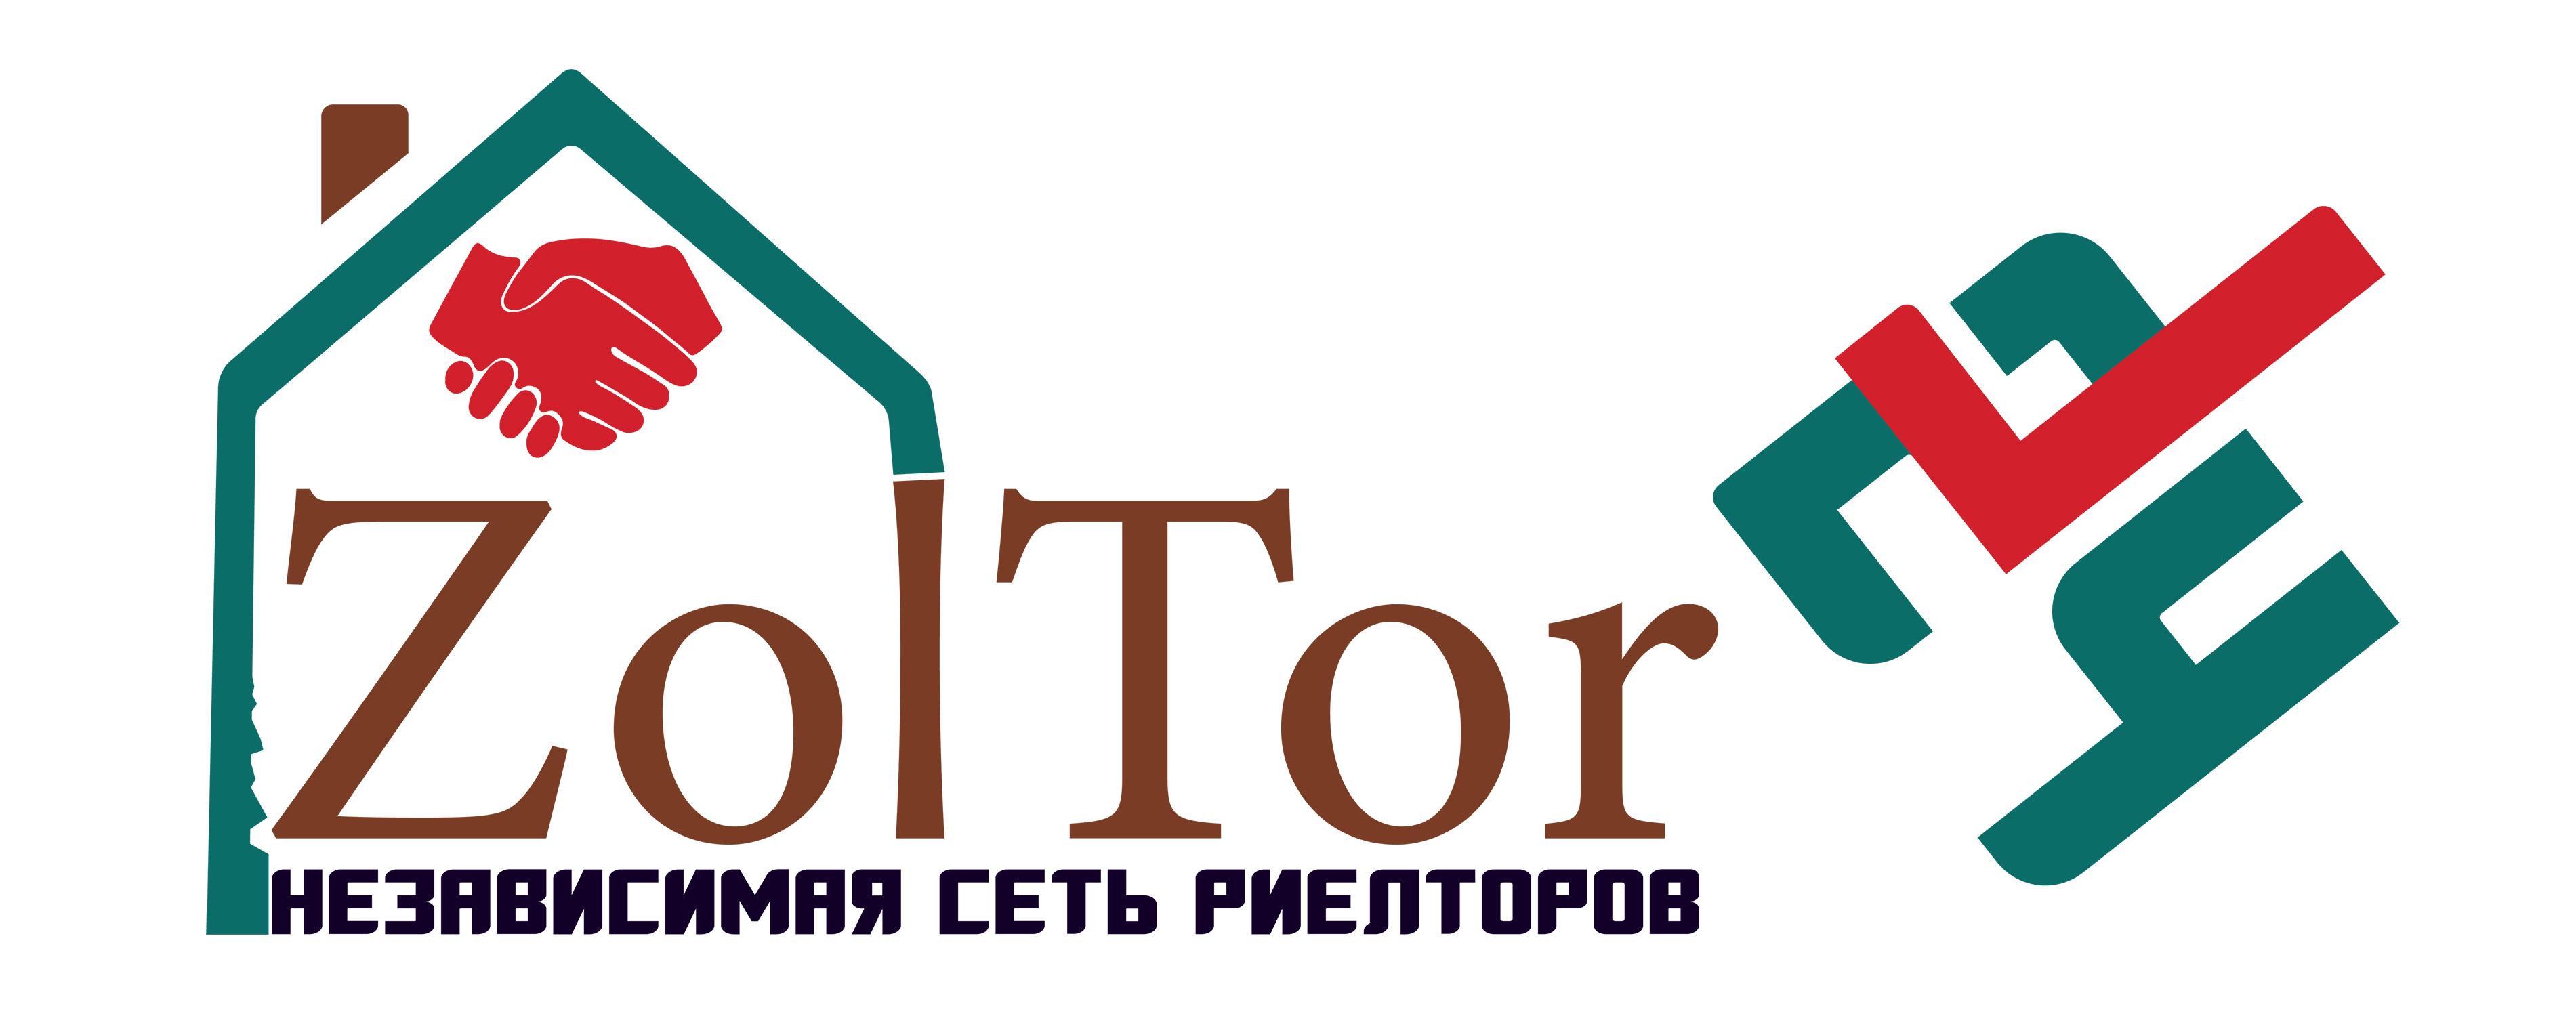 Логотип и фирменный стиль ZolTor24 фото f_4865c877852add39.jpg